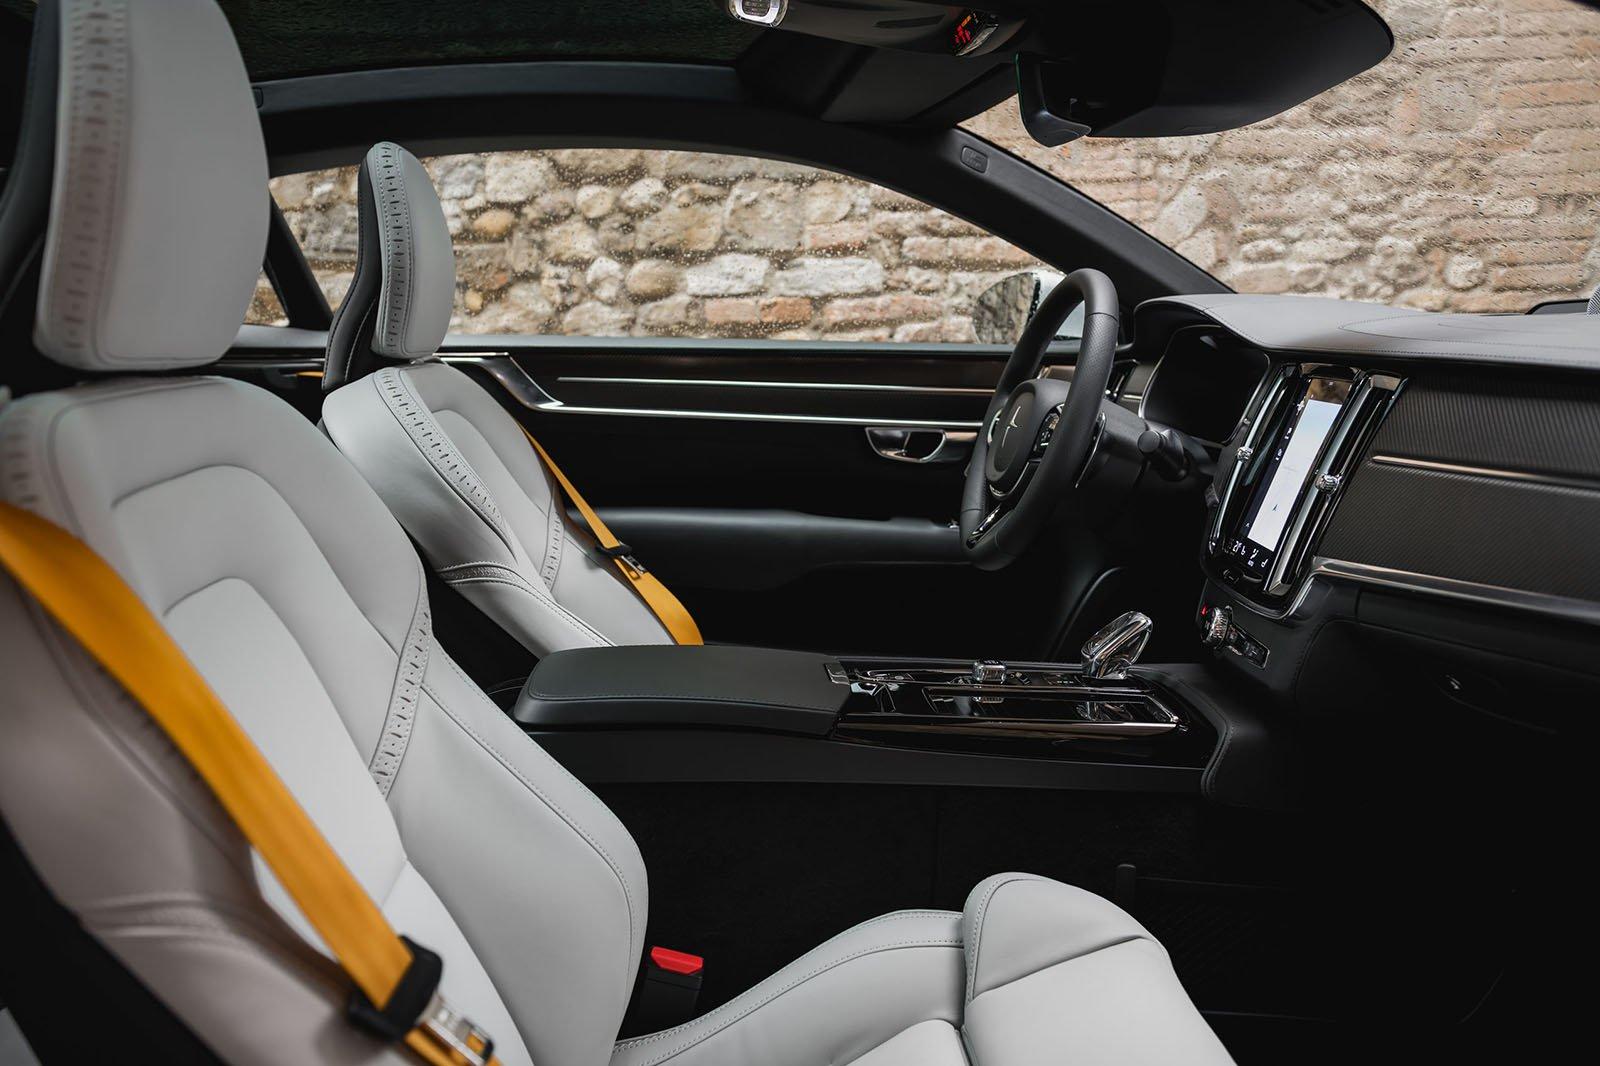 Polestar 1 2019 LHD front seats